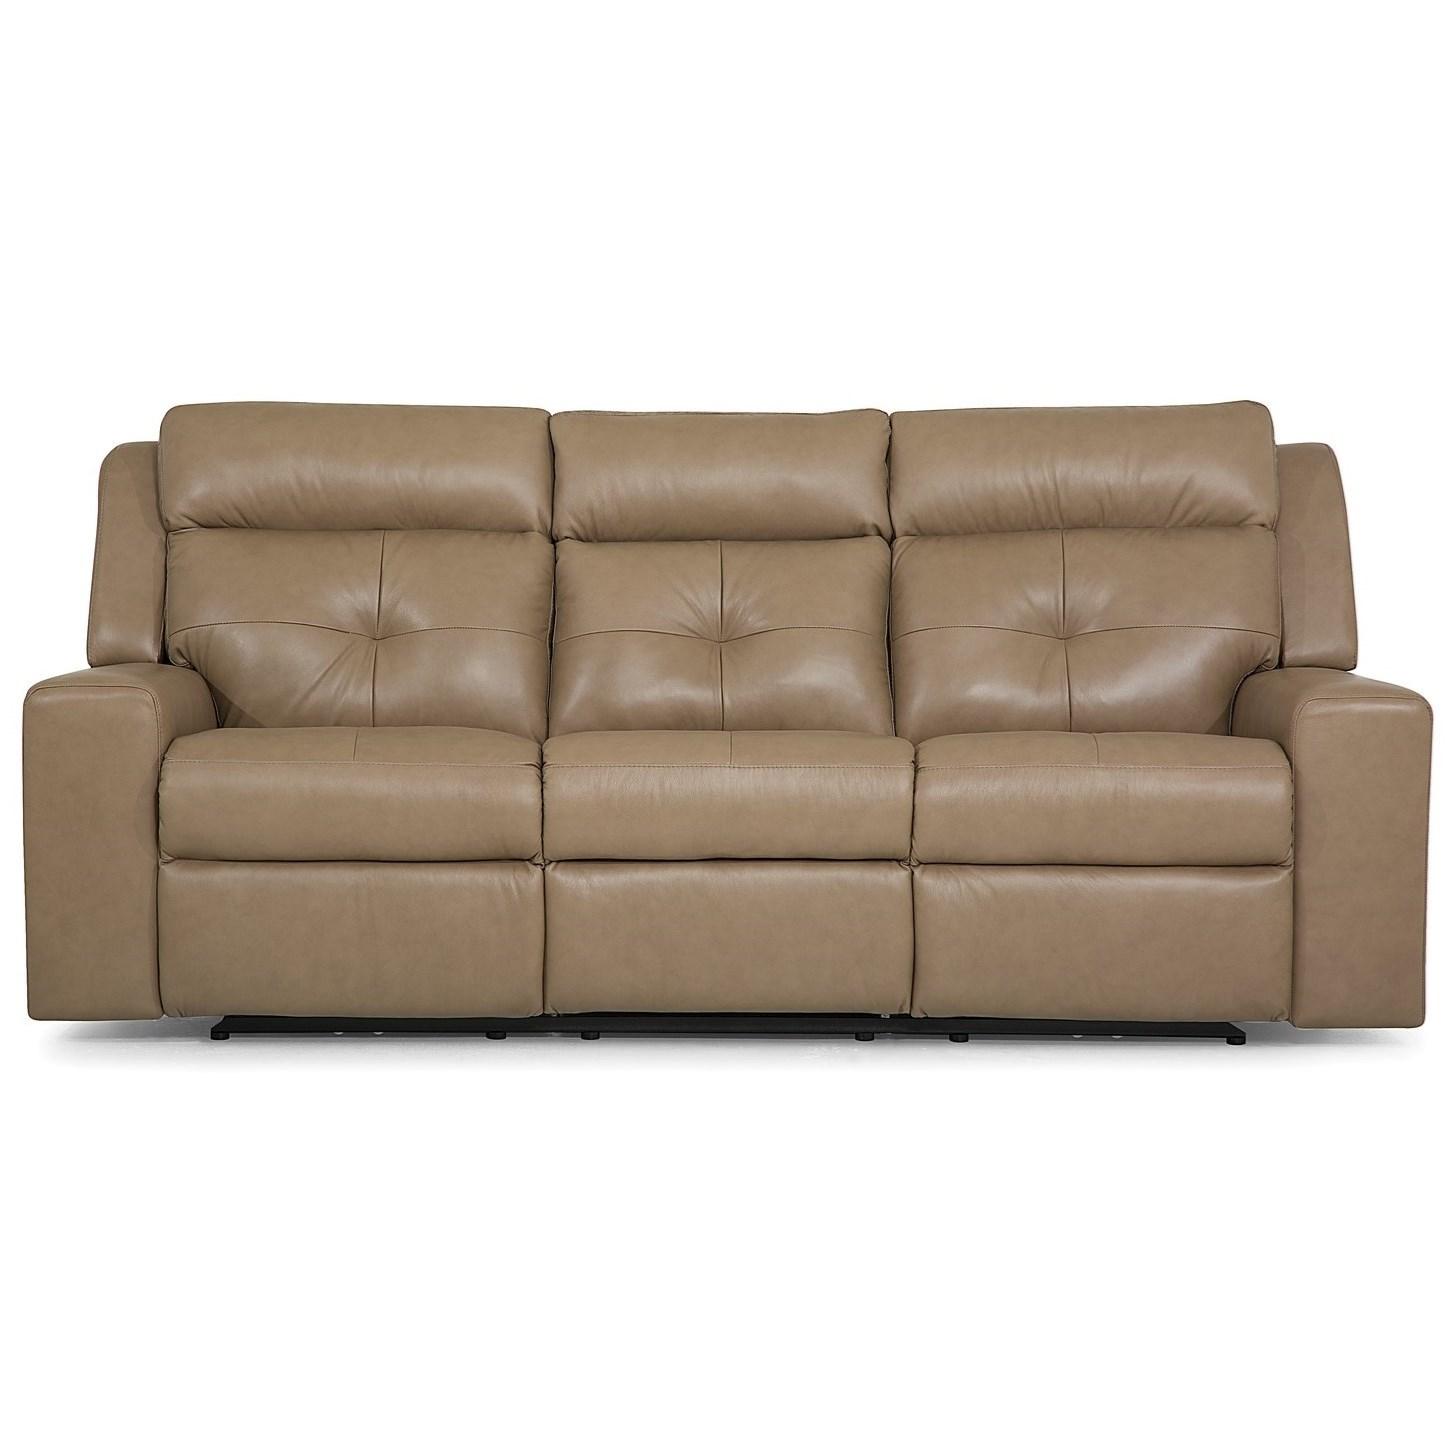 Grove Sofa PwrRecliner w/ Power Headrest by Palliser at Mueller Furniture